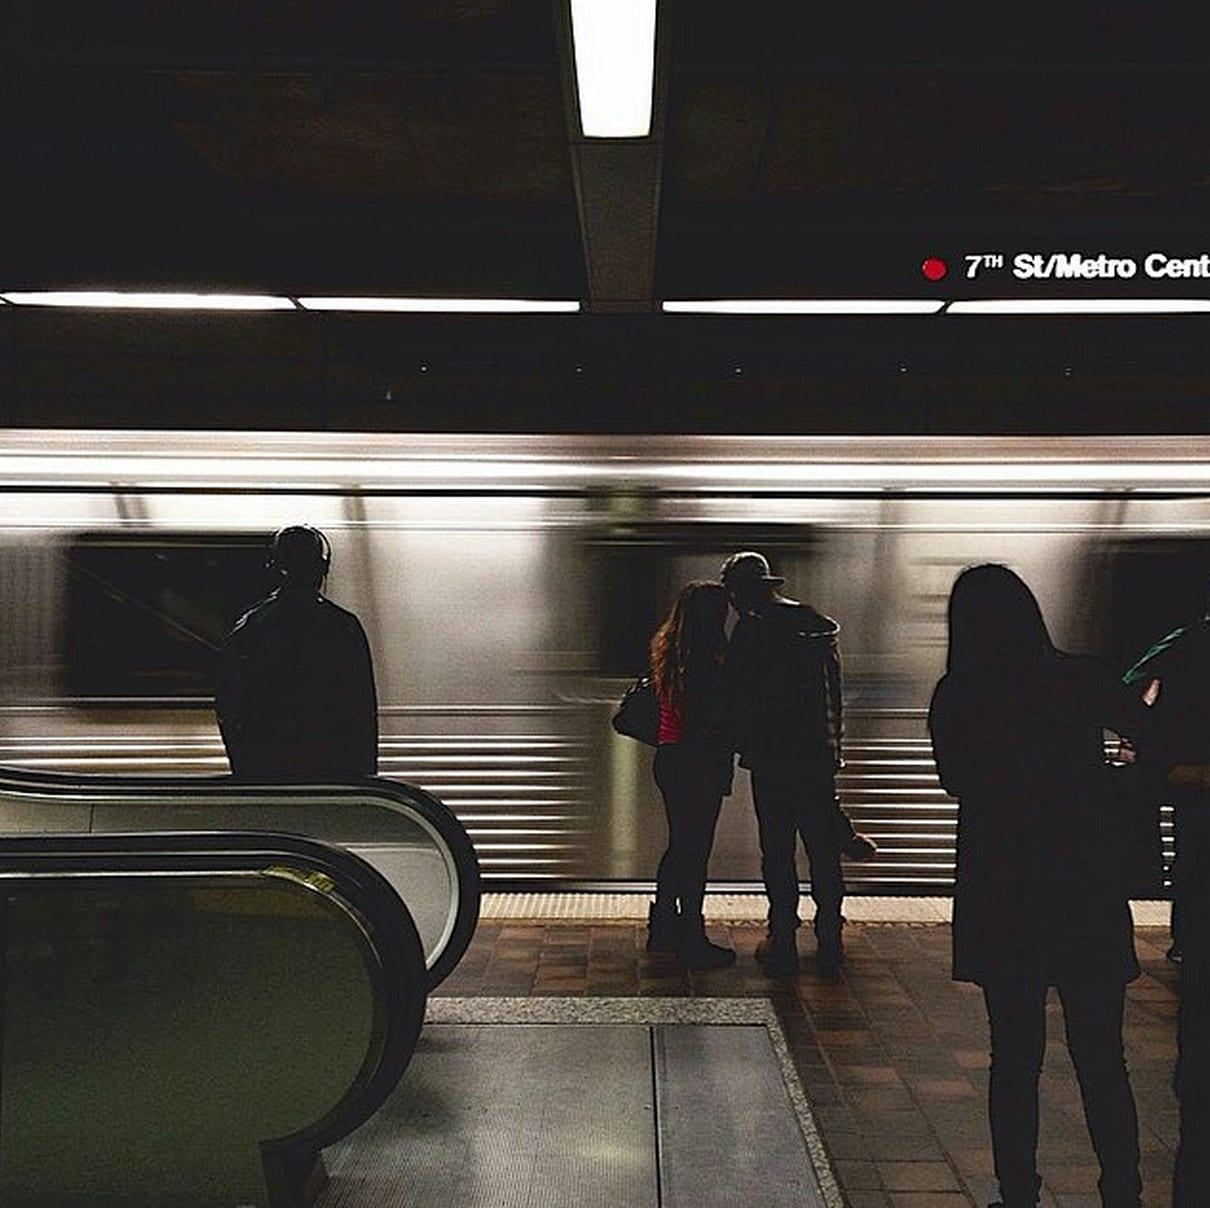 7th Street / Metro Center Station. Photo by @ilegend_photo via Instagram.